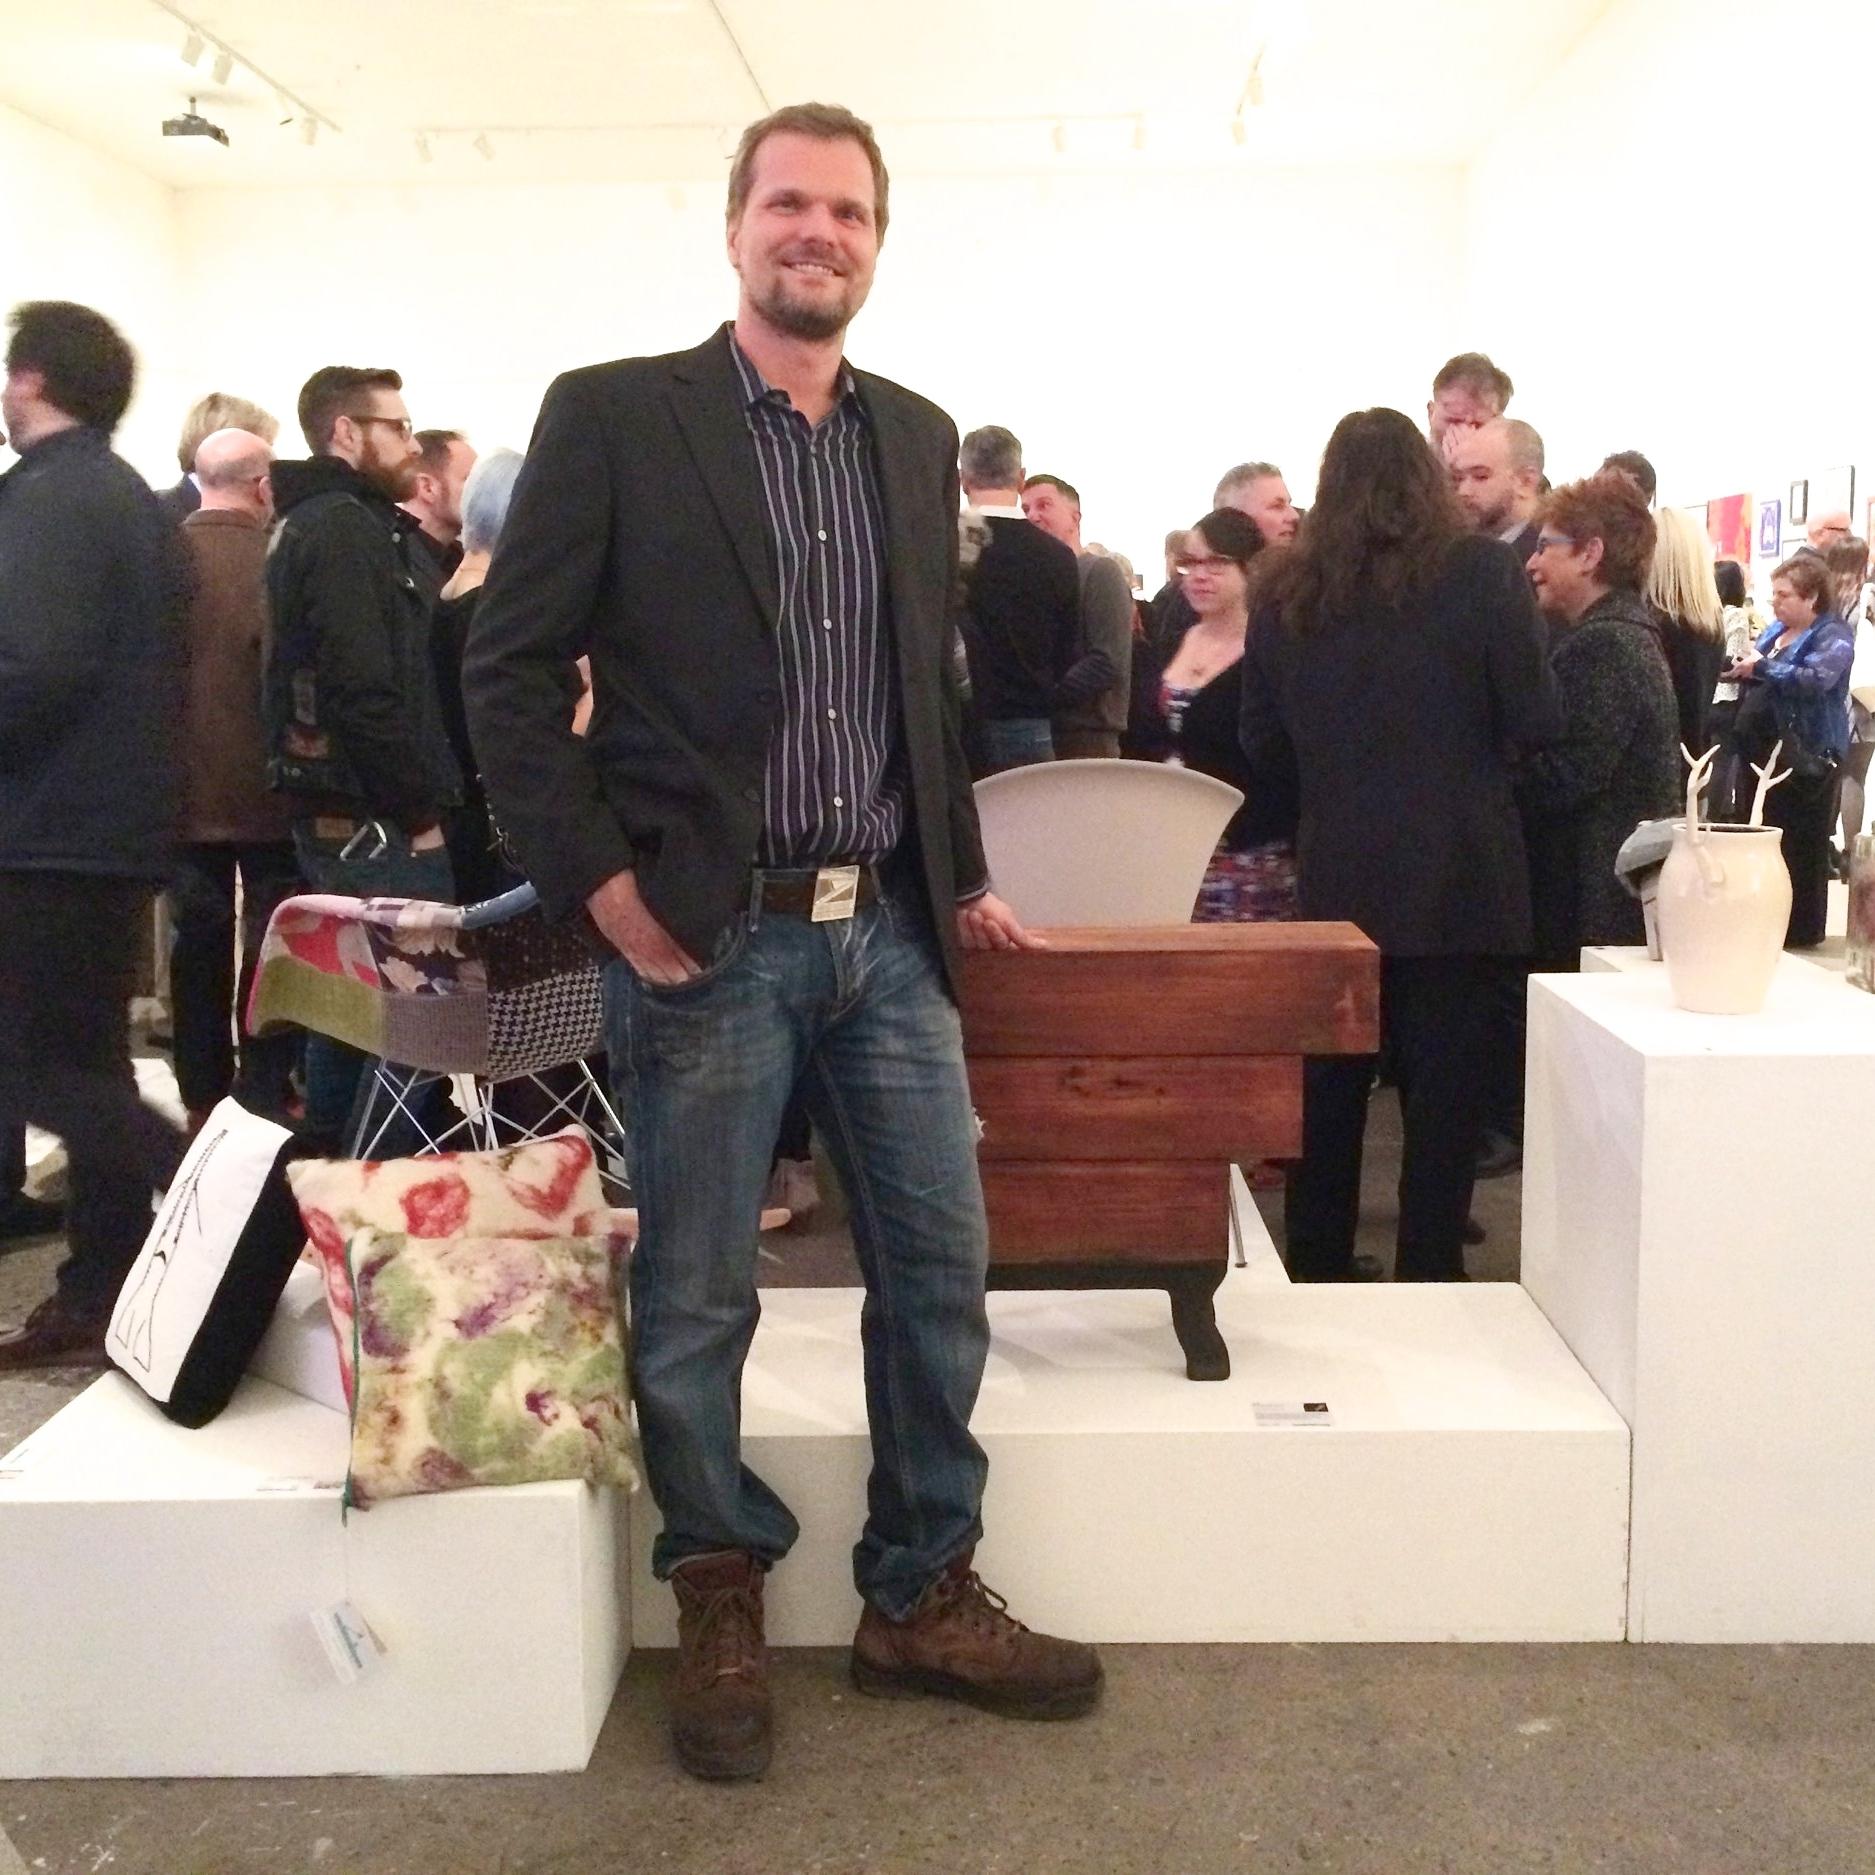 Jason Allen Pemberton at InLiquid Arts Benefit with Reclaimed Table